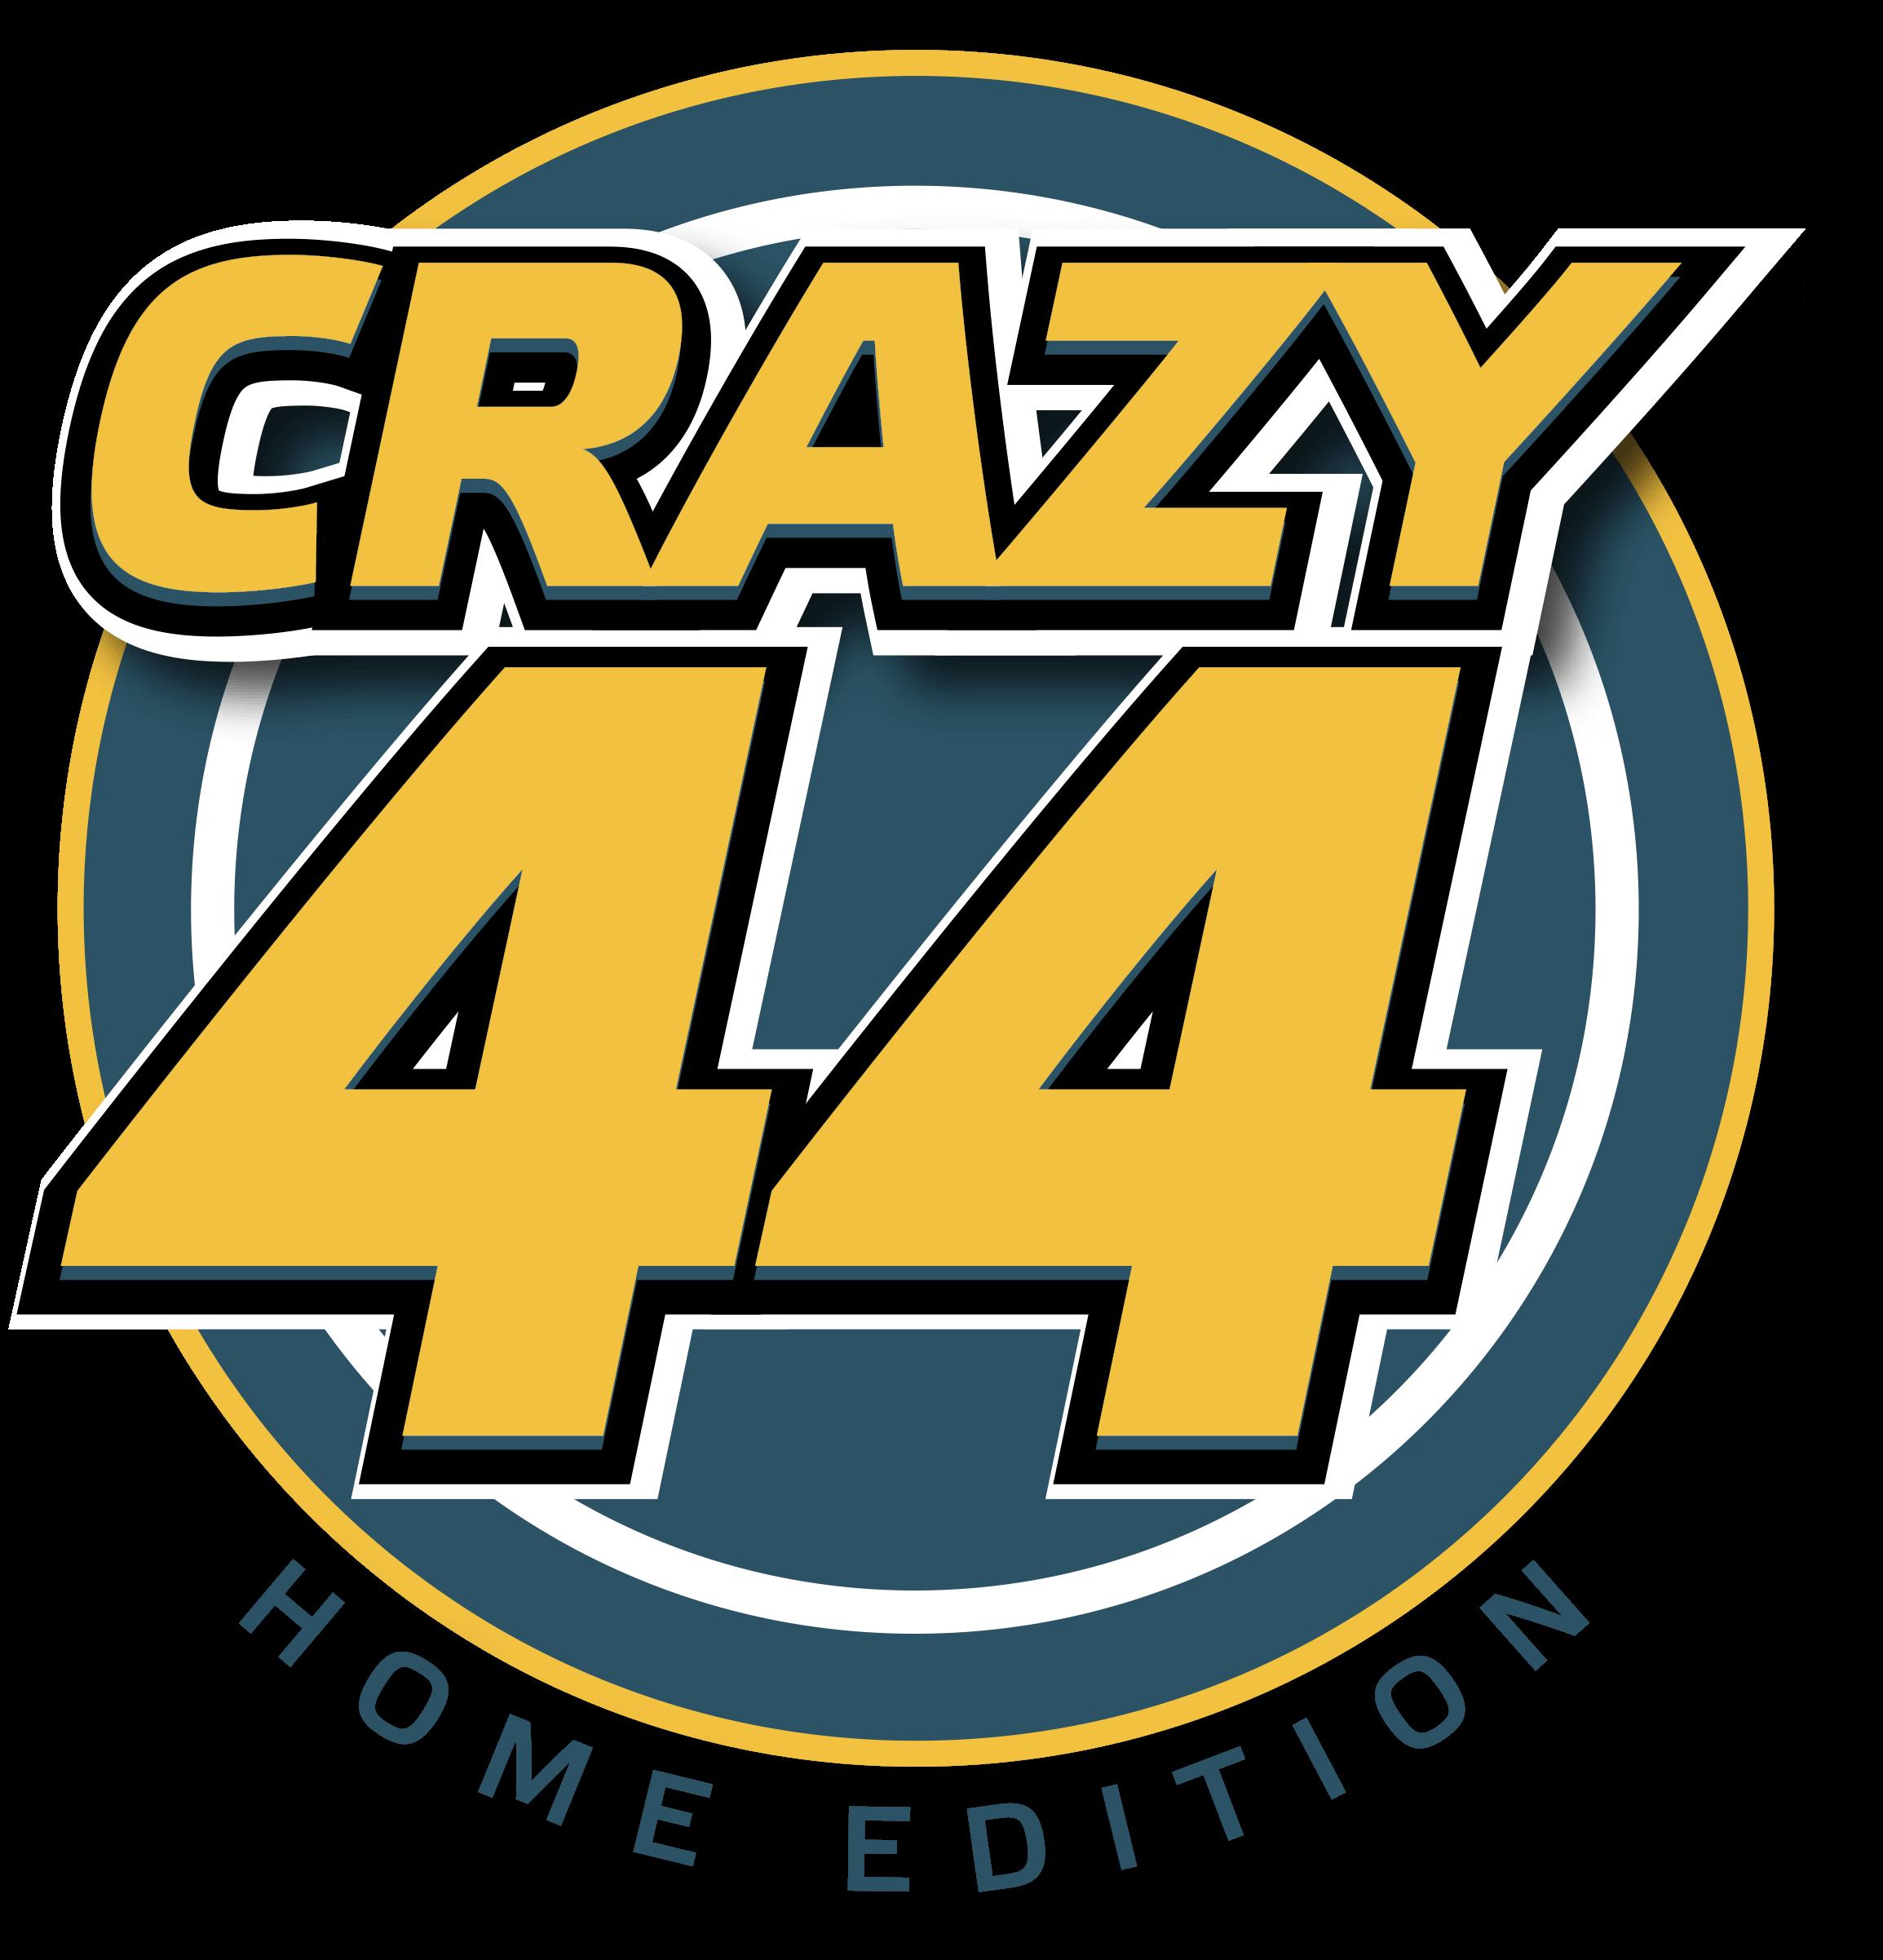 Crazy 44!